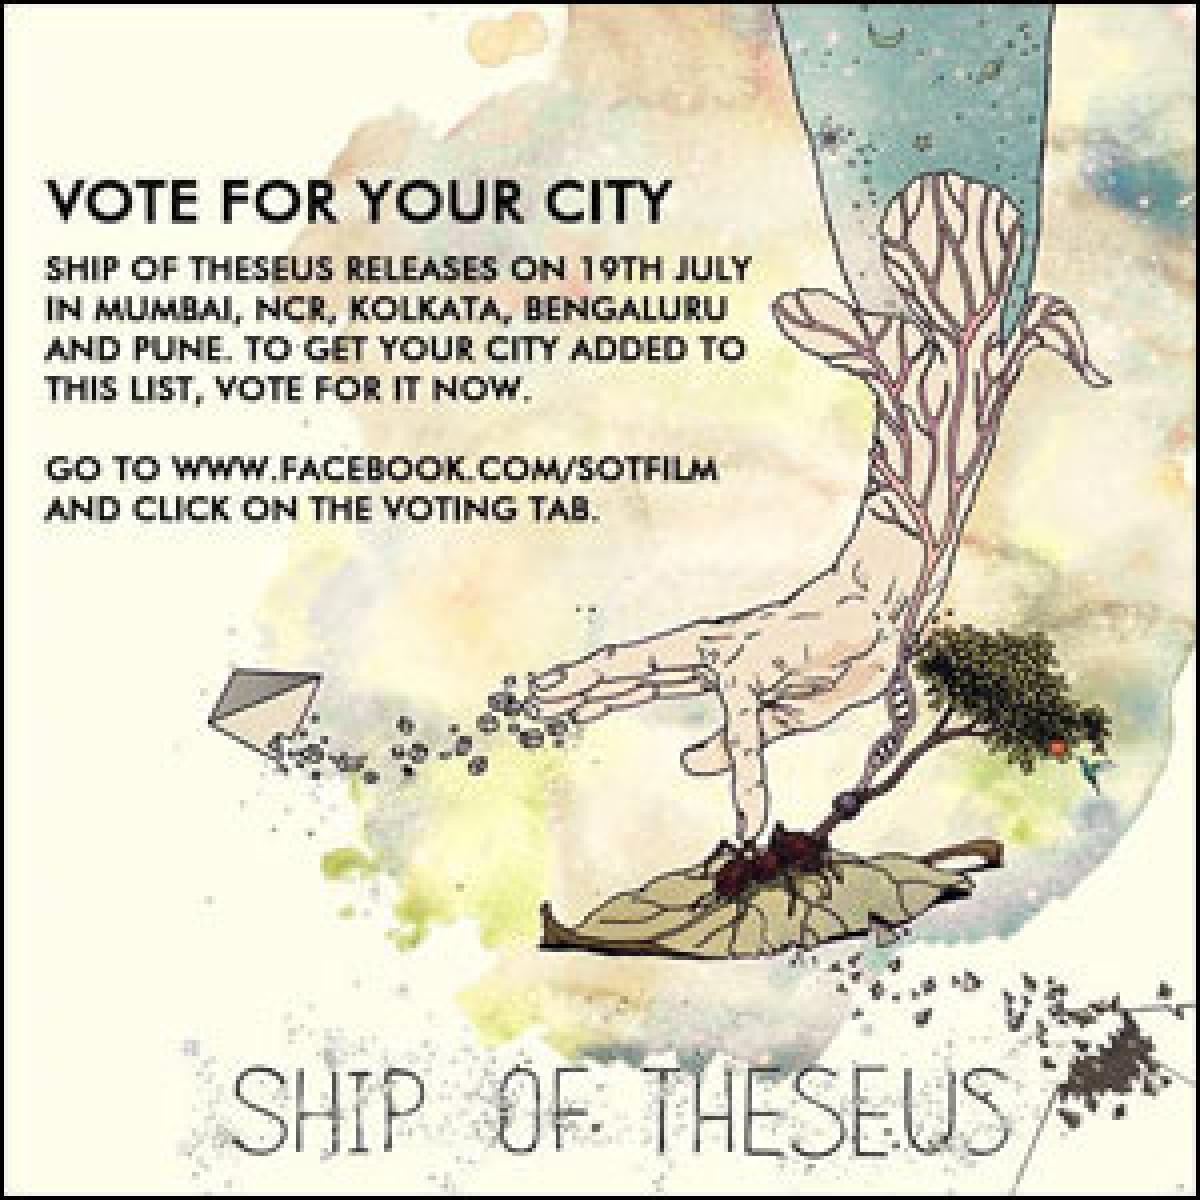 Disney UTV runs digital campaign to distribute Ship of Theseus